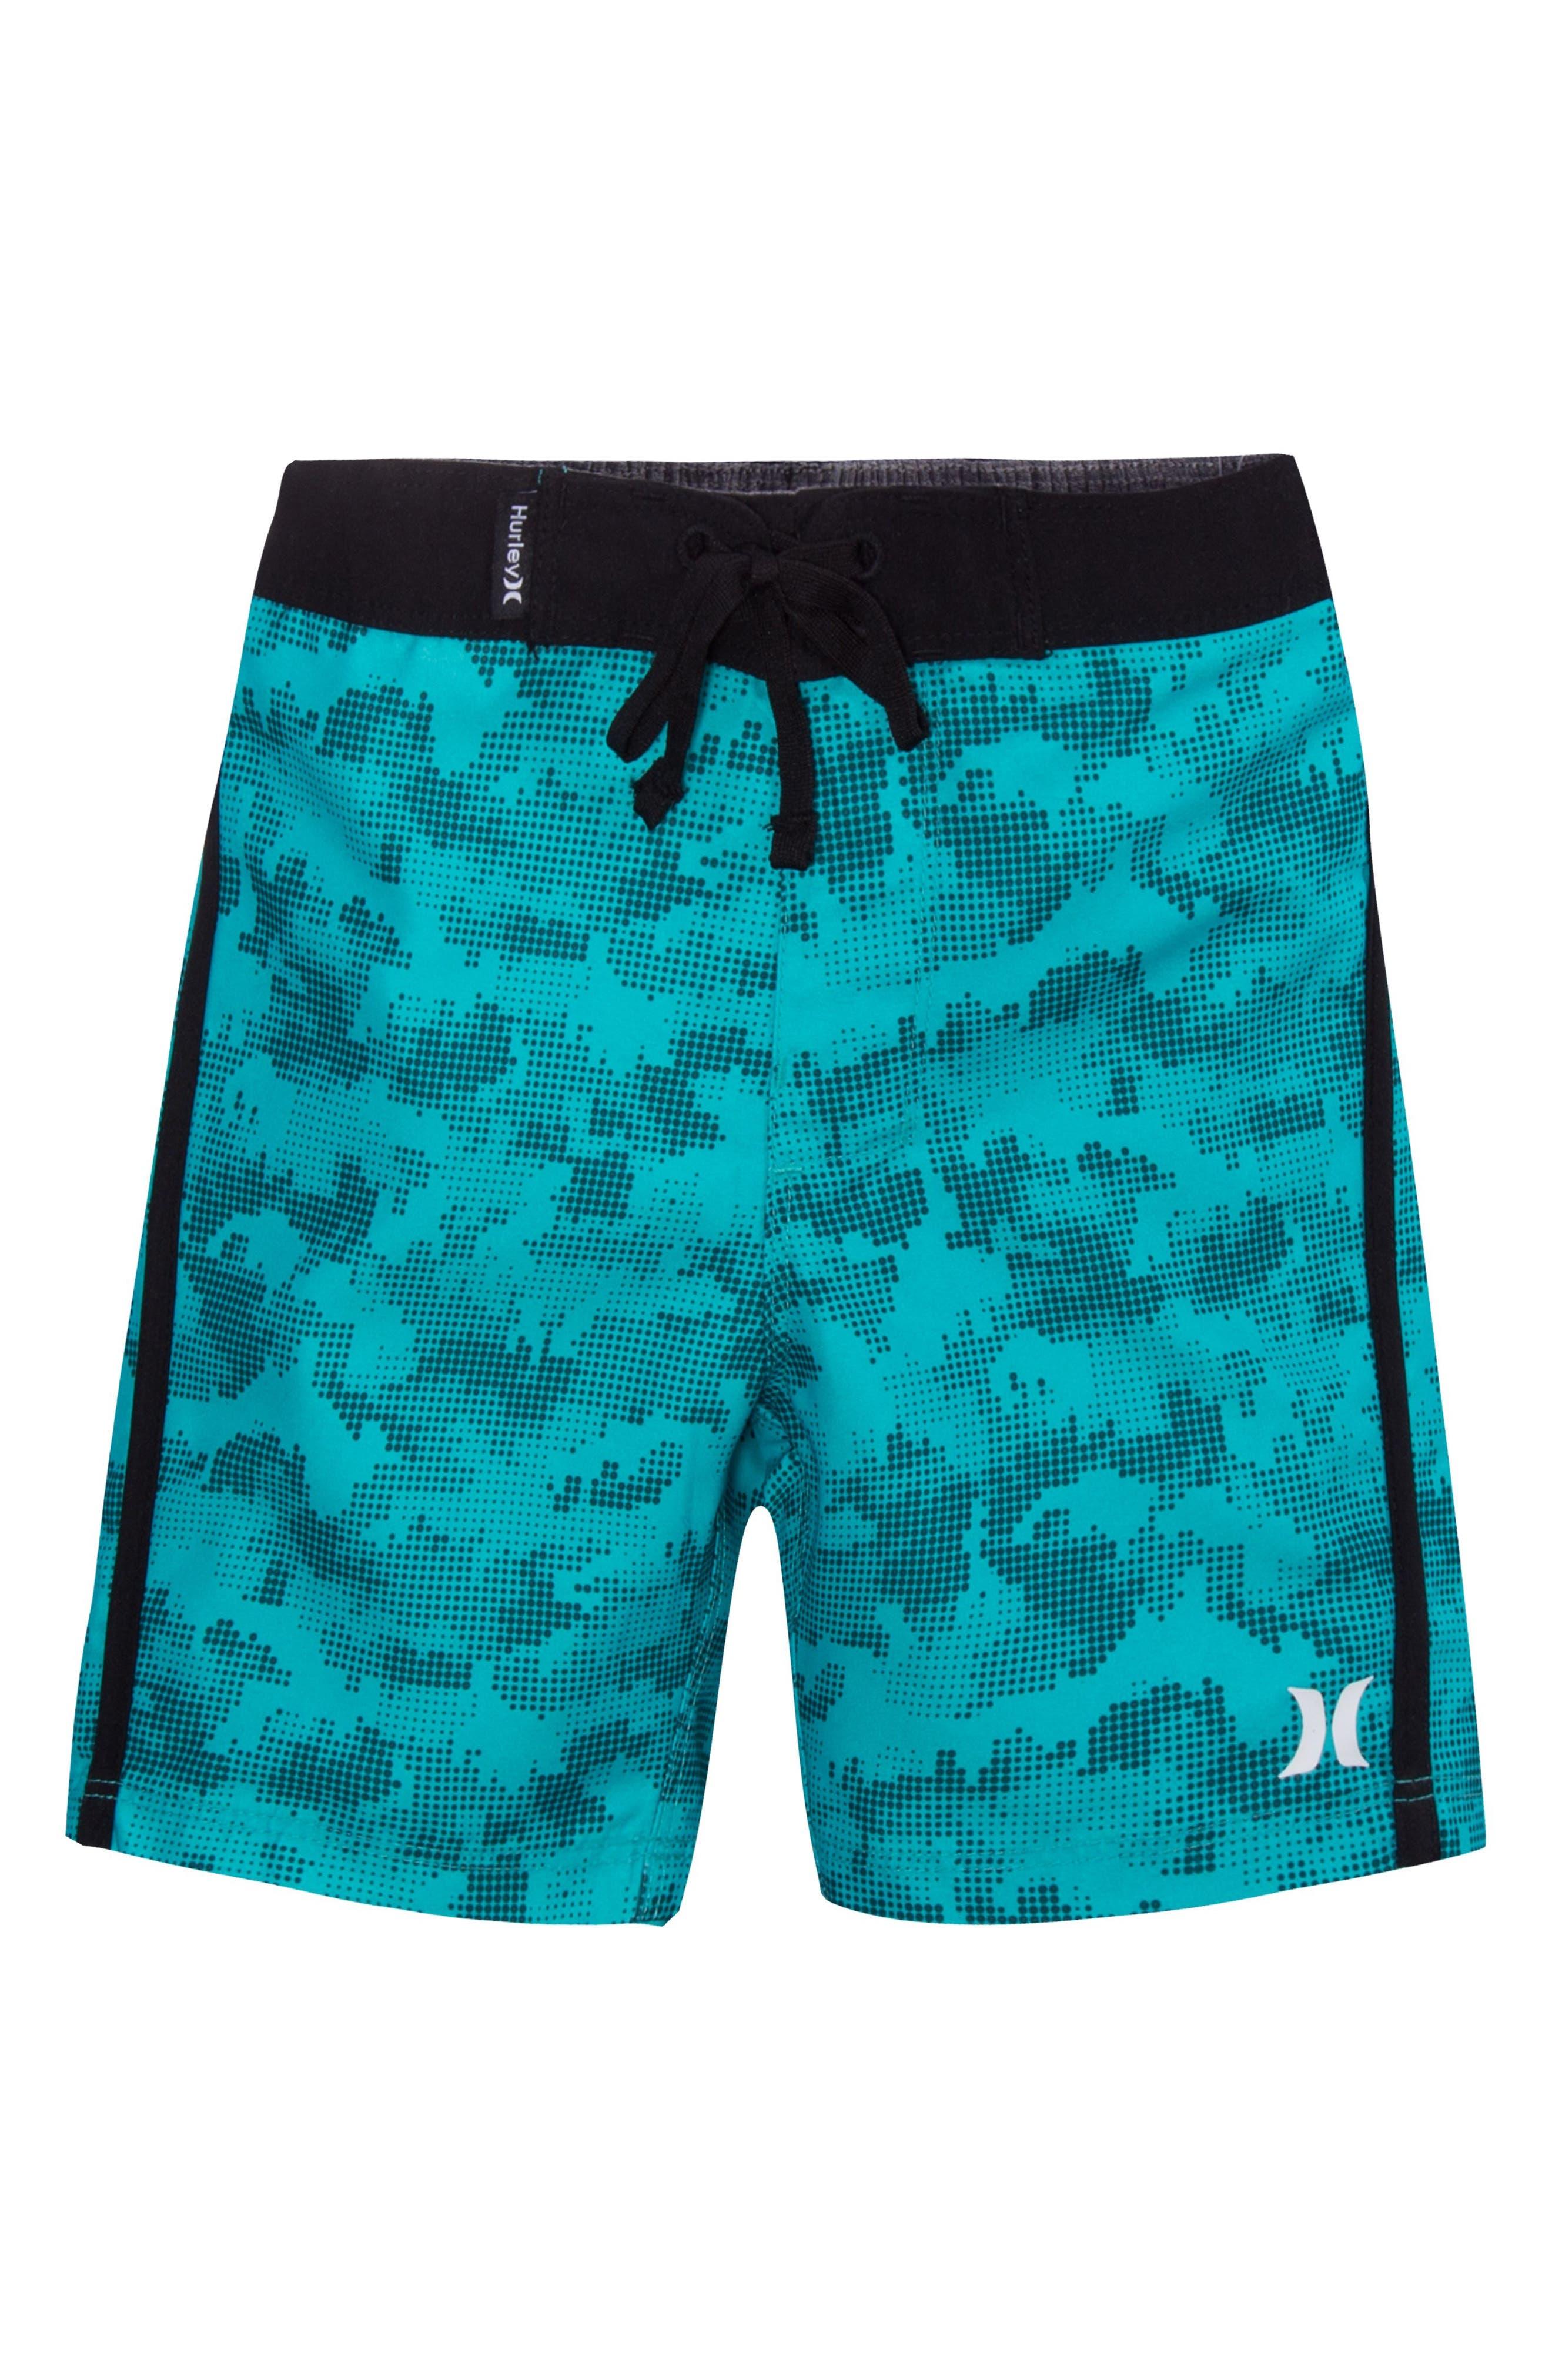 Micro Camo Board Shorts,                             Main thumbnail 1, color,                             Clear Jade